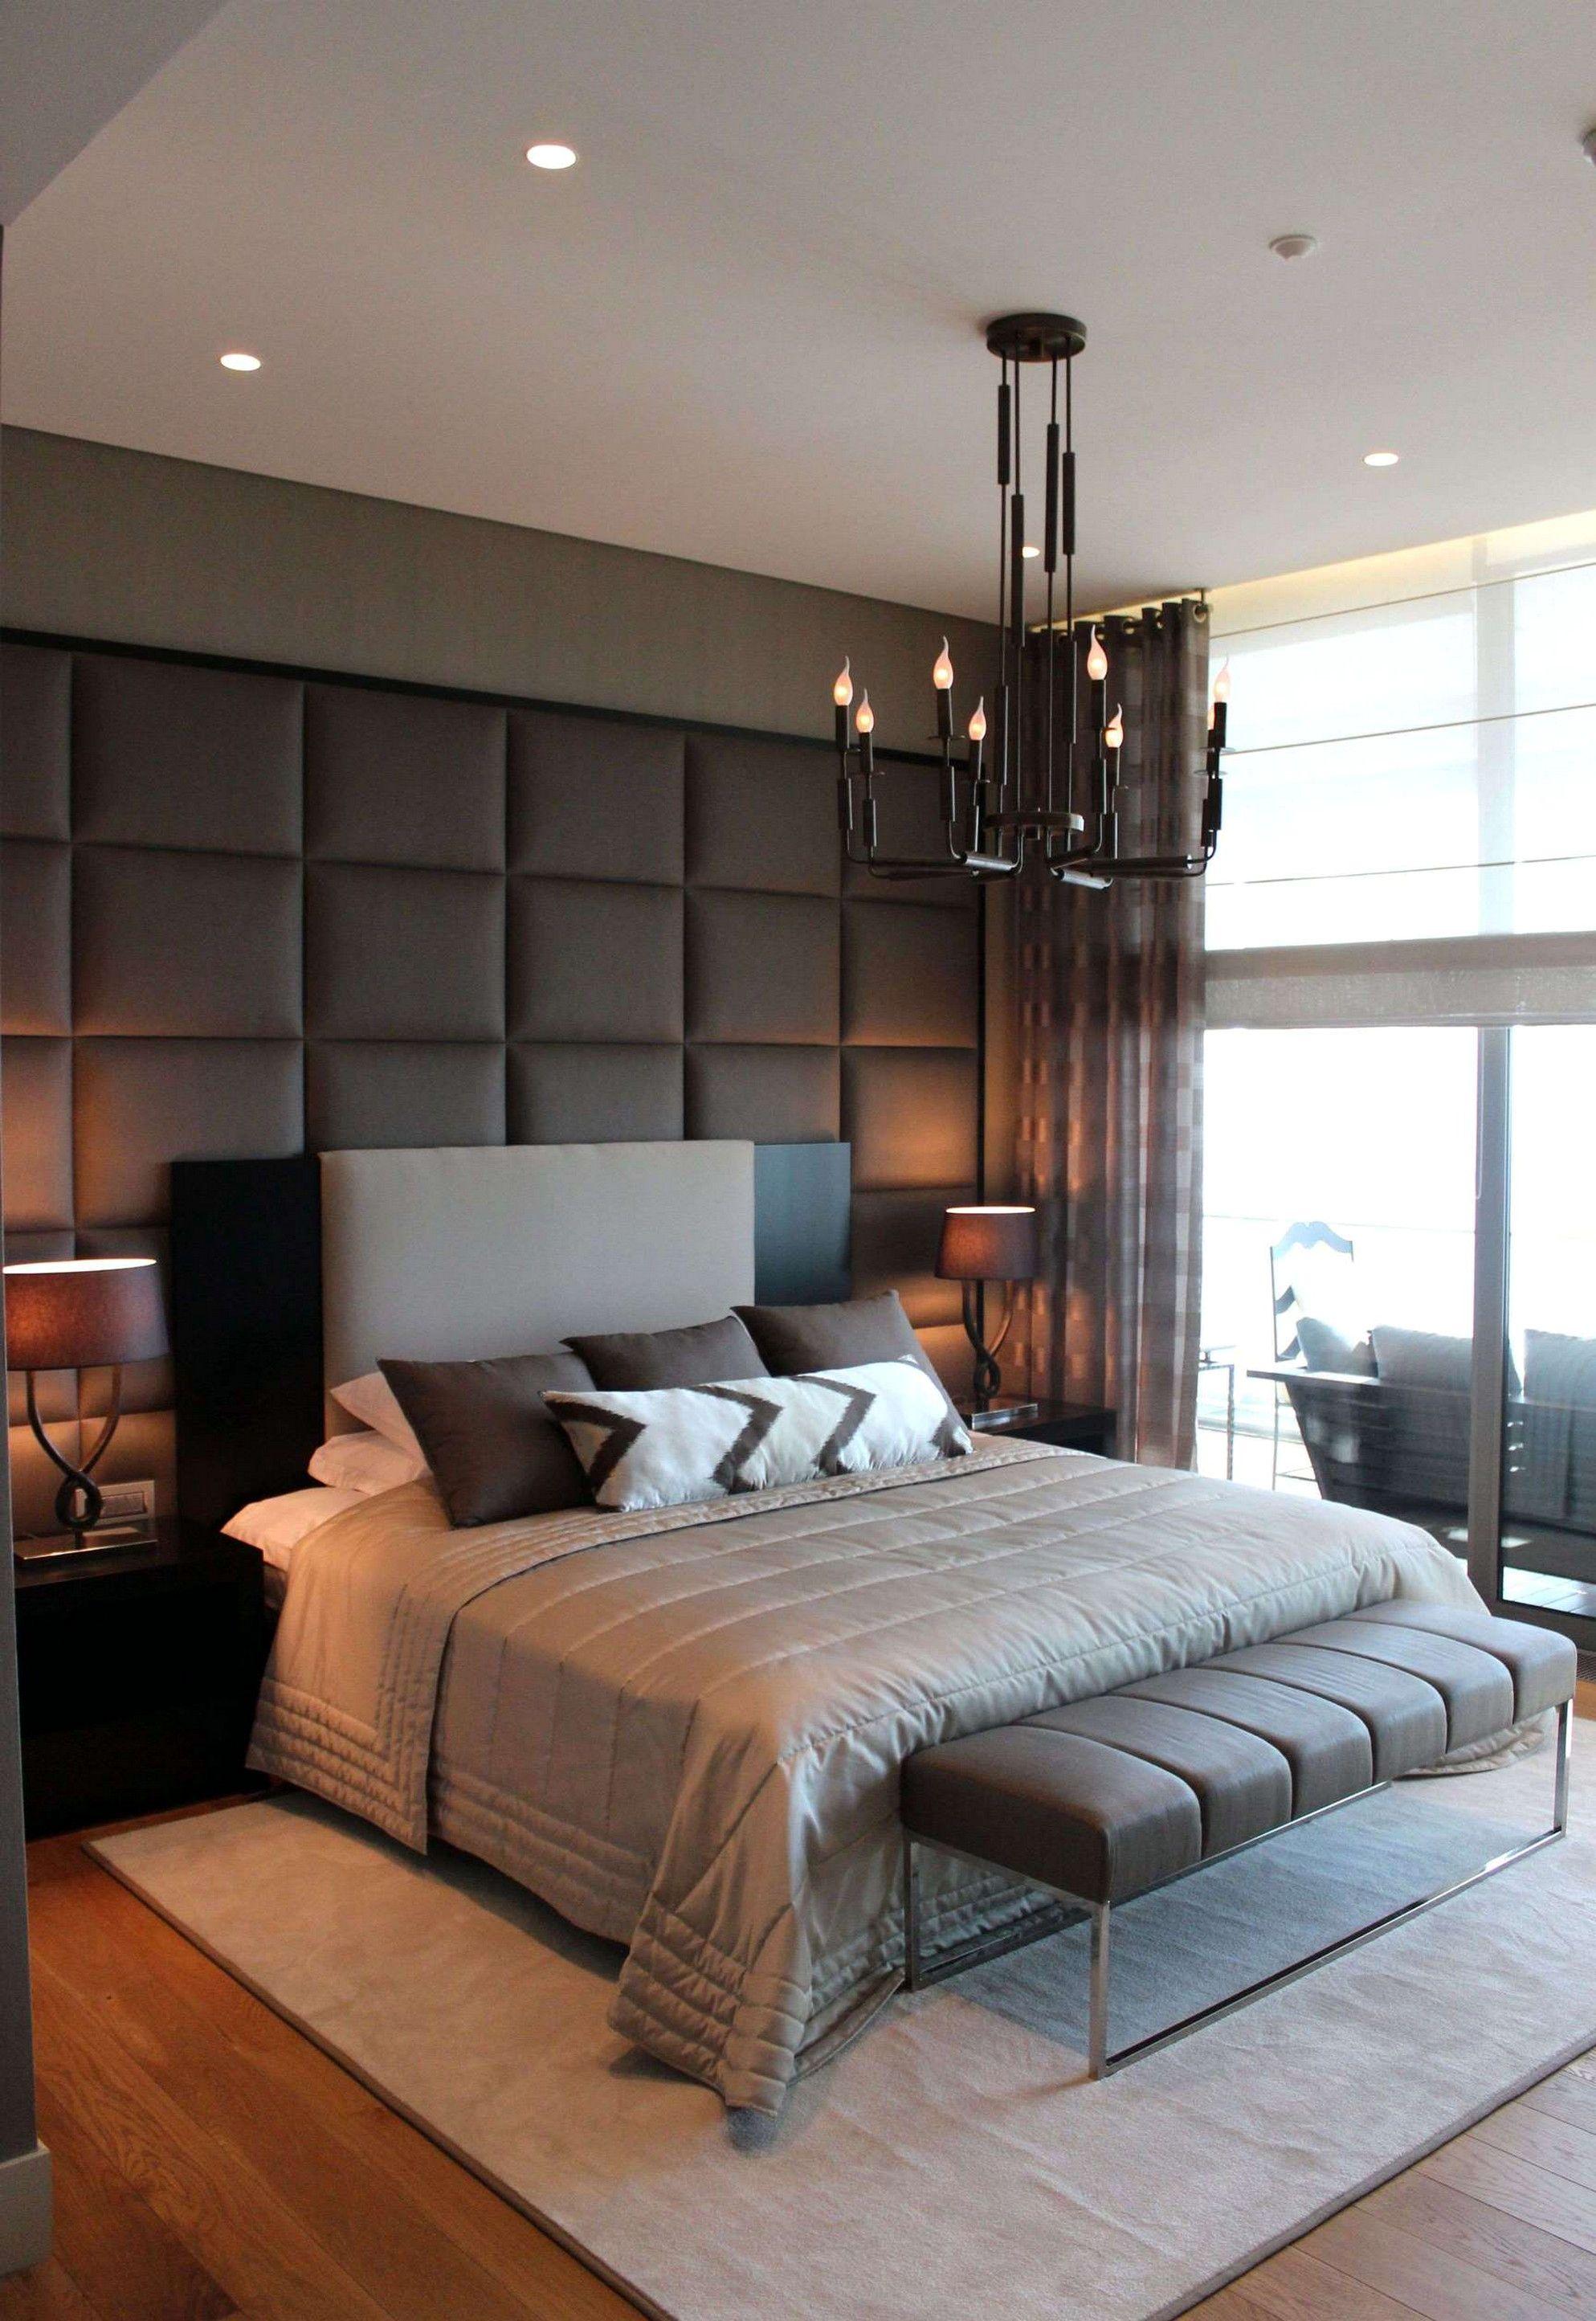 Romantic Bedroom Decorating Ideas Small Modern Bedroom Modern